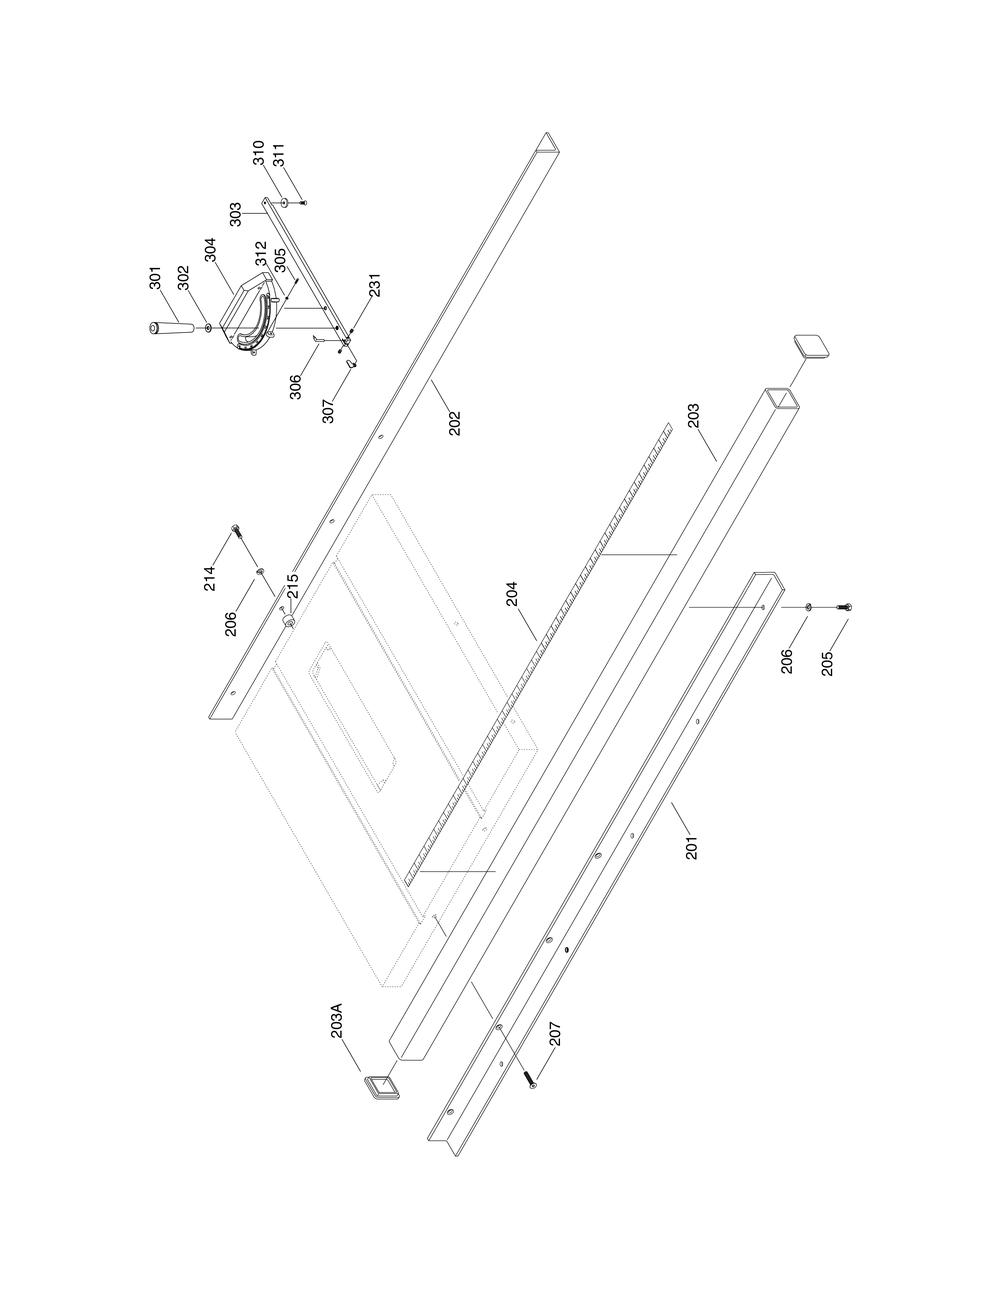 Heatcraft evaporator wiring diagram free download wiring diagrams